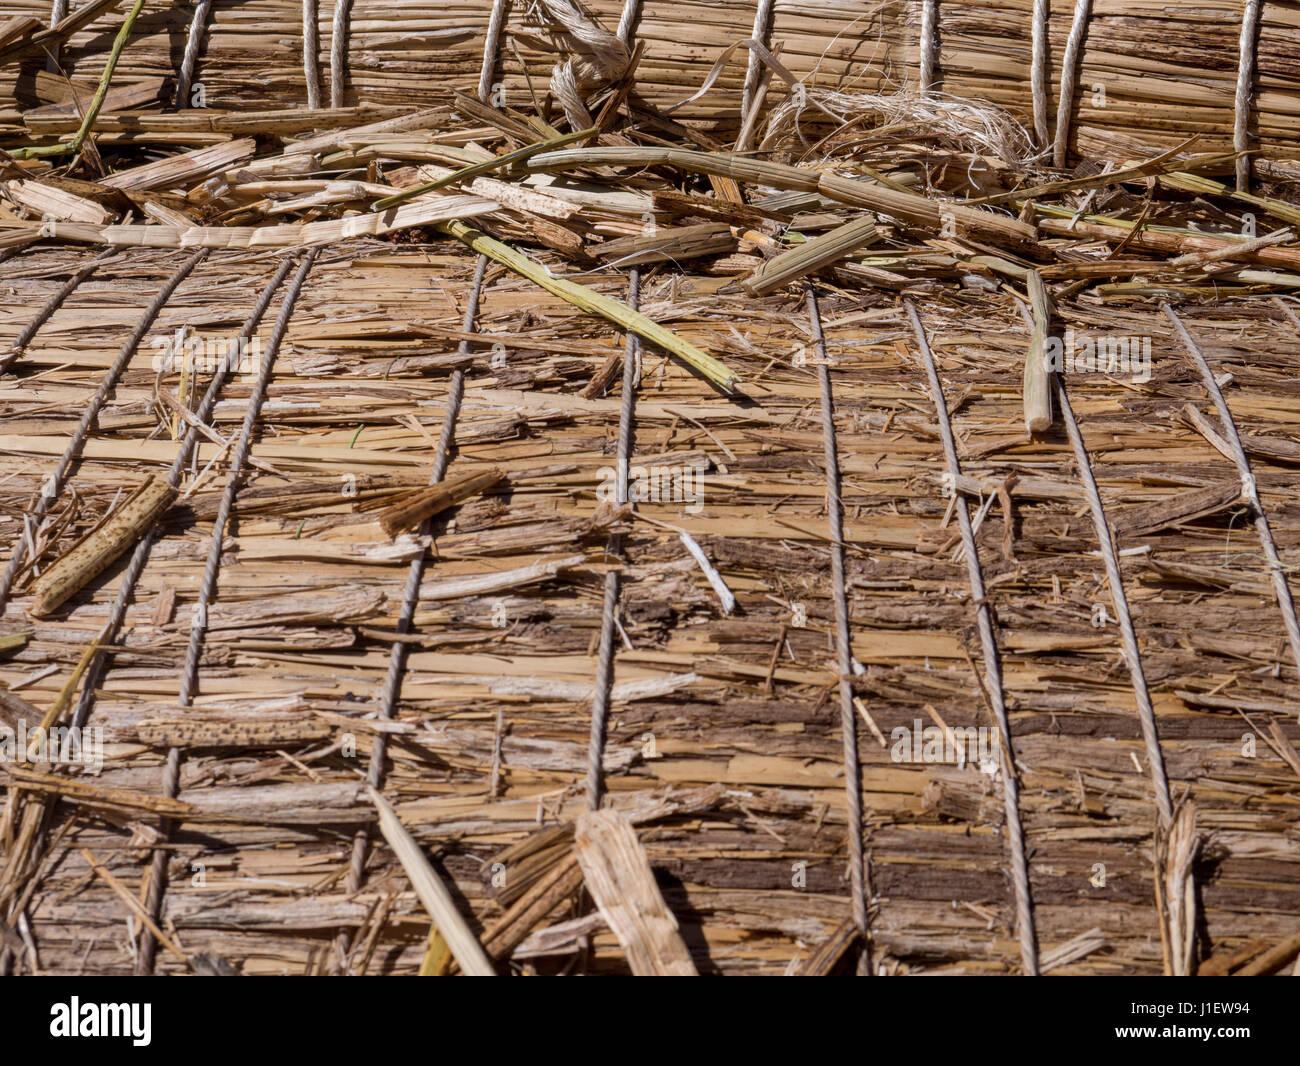 Titikaka reed bundle. A beam of Uros reed detail - Stock Image